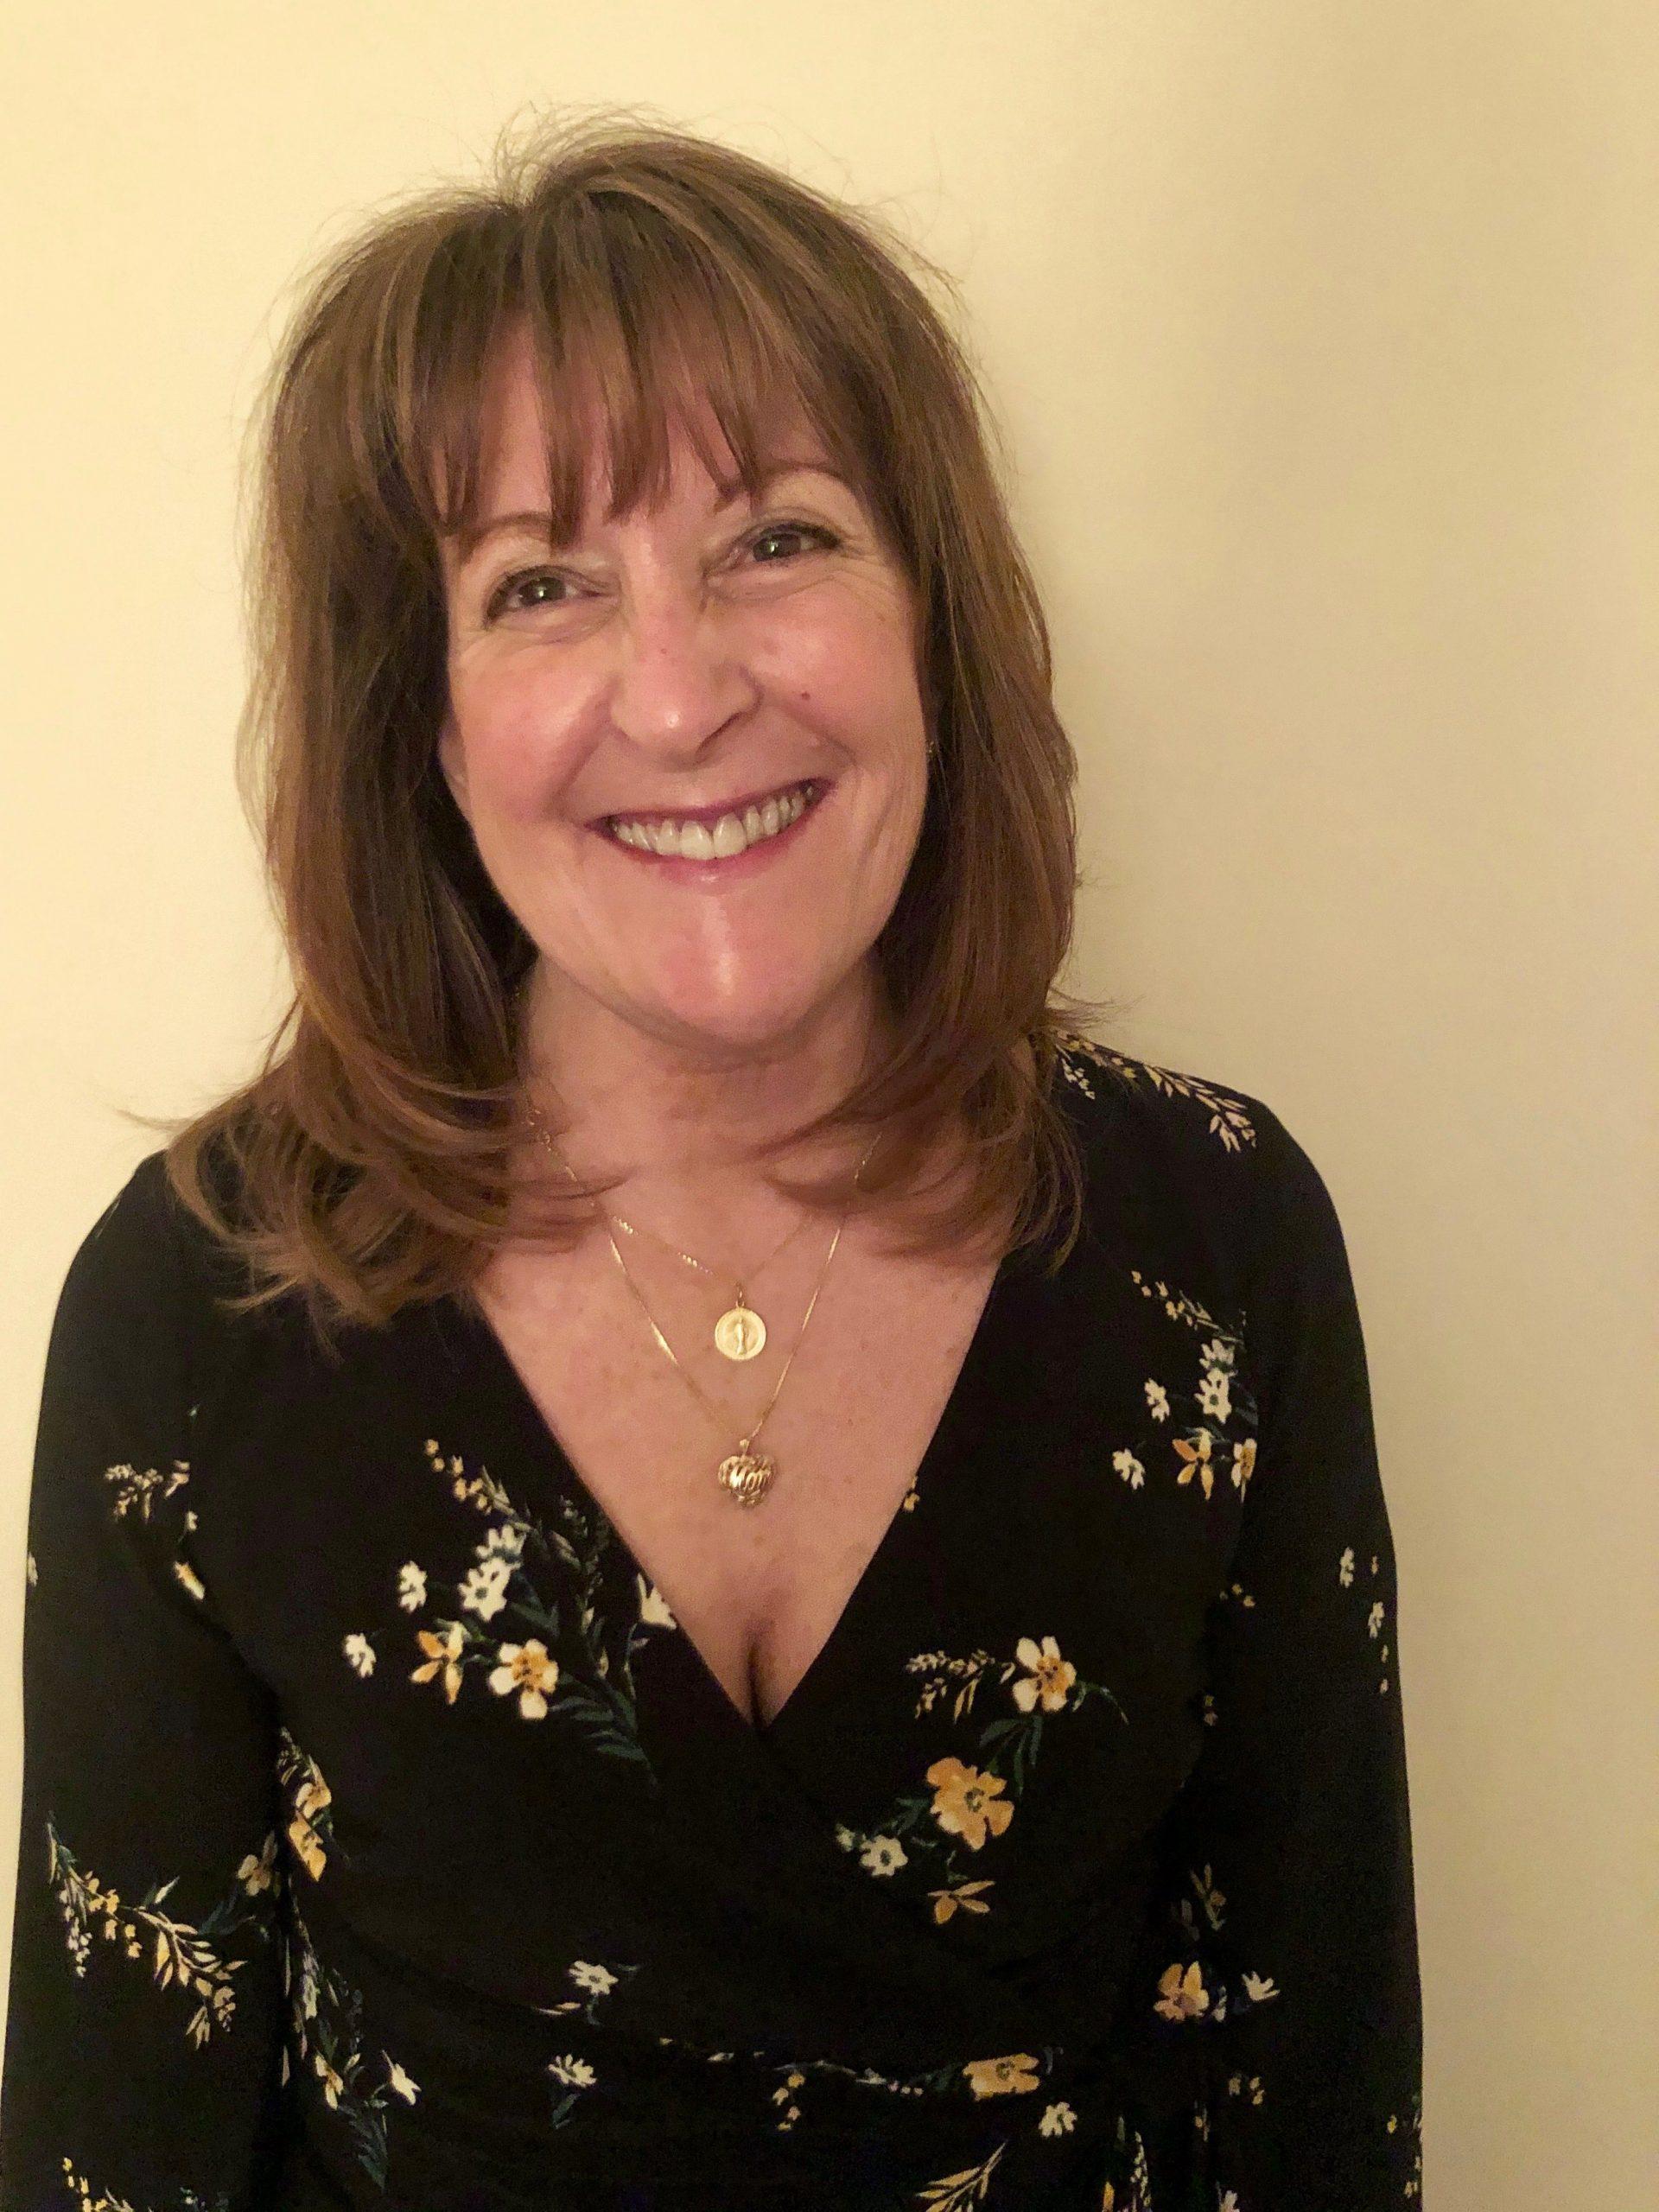 Headshot of Mary Vineis, who retired Dec. 20 as NewBridge's director of Community Response and Education